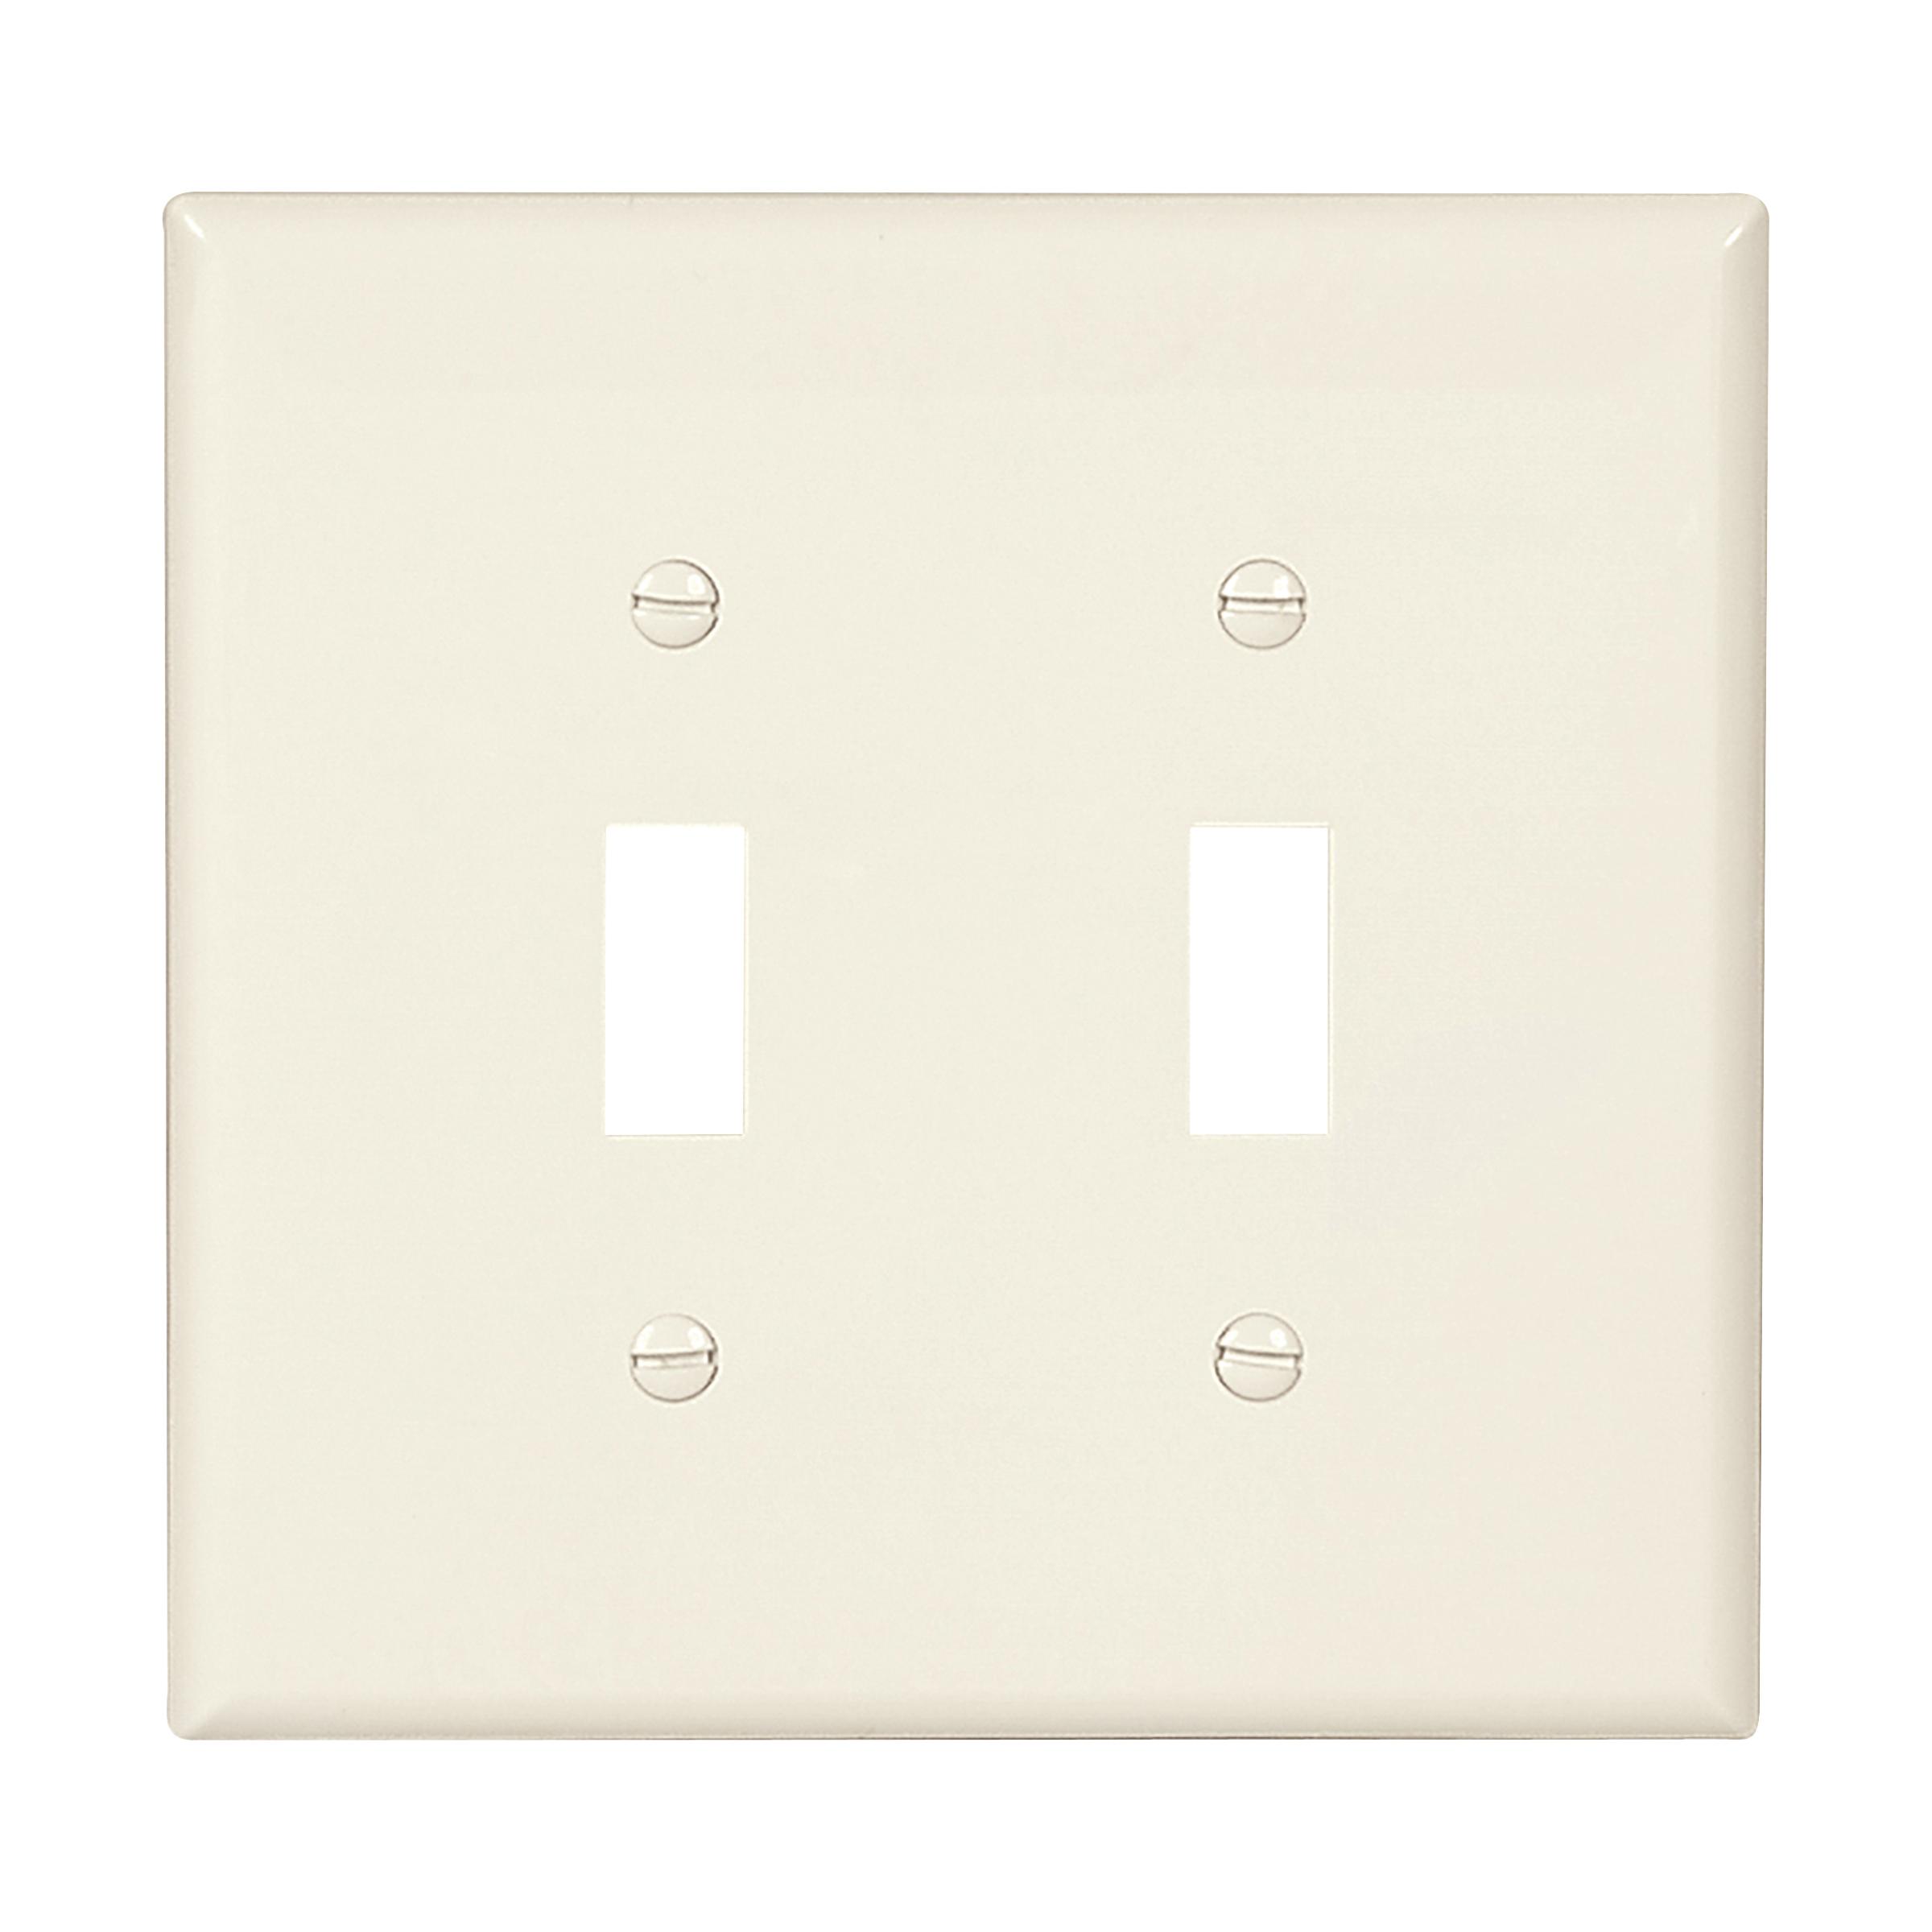 Mid-size Toggle Switch Wallplate (EAT PJ2LA 2G NYLON MIDSIZE SWITCH)